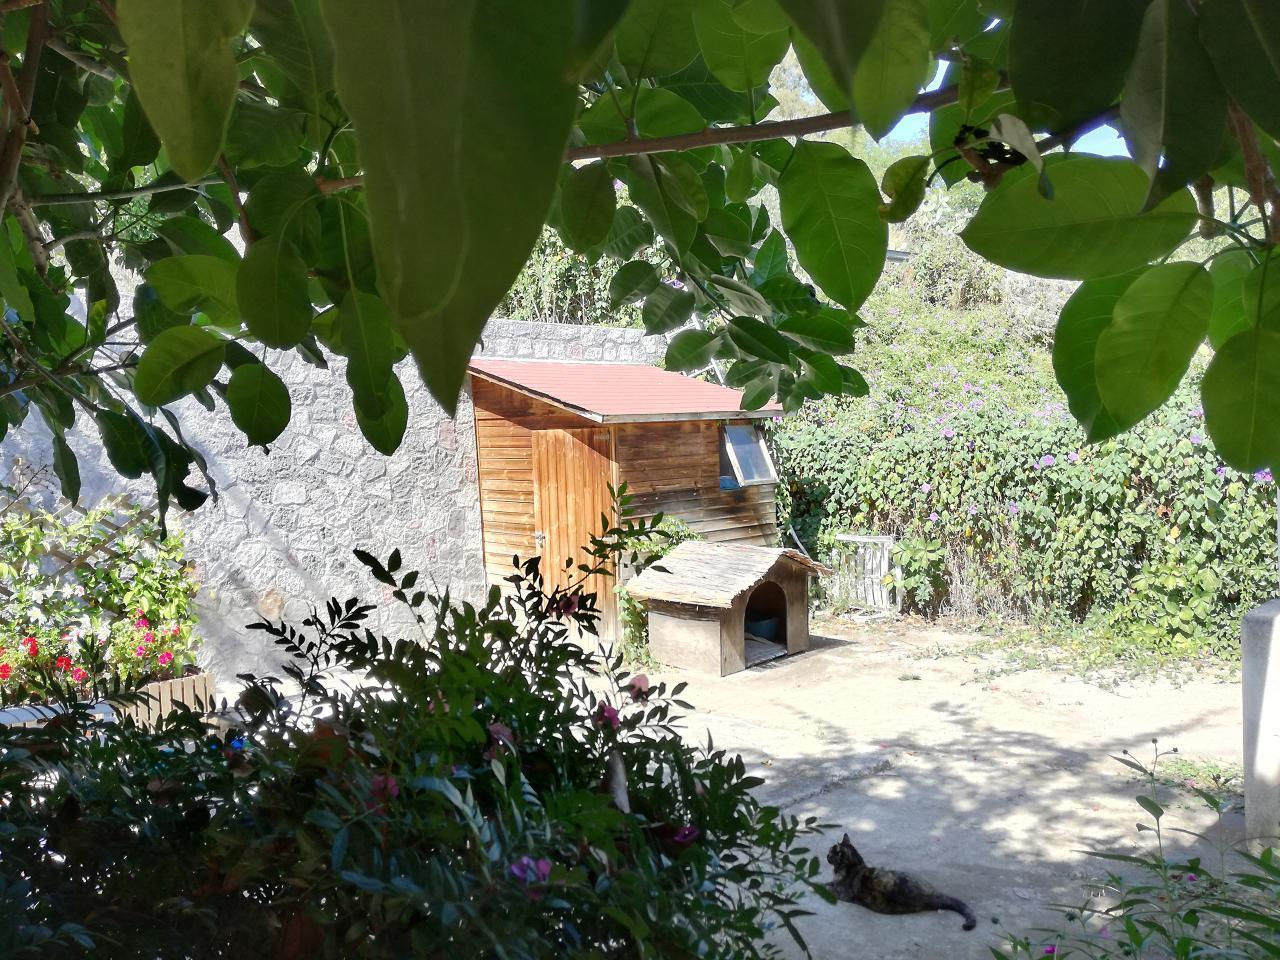 Maison de vacances Ferienhaushälfte Solandra auf sizilianischer Insel mit atemberaubenden Meeres-Rundblick (2038046), Lipari, Lipari, Sicile, Italie, image 36